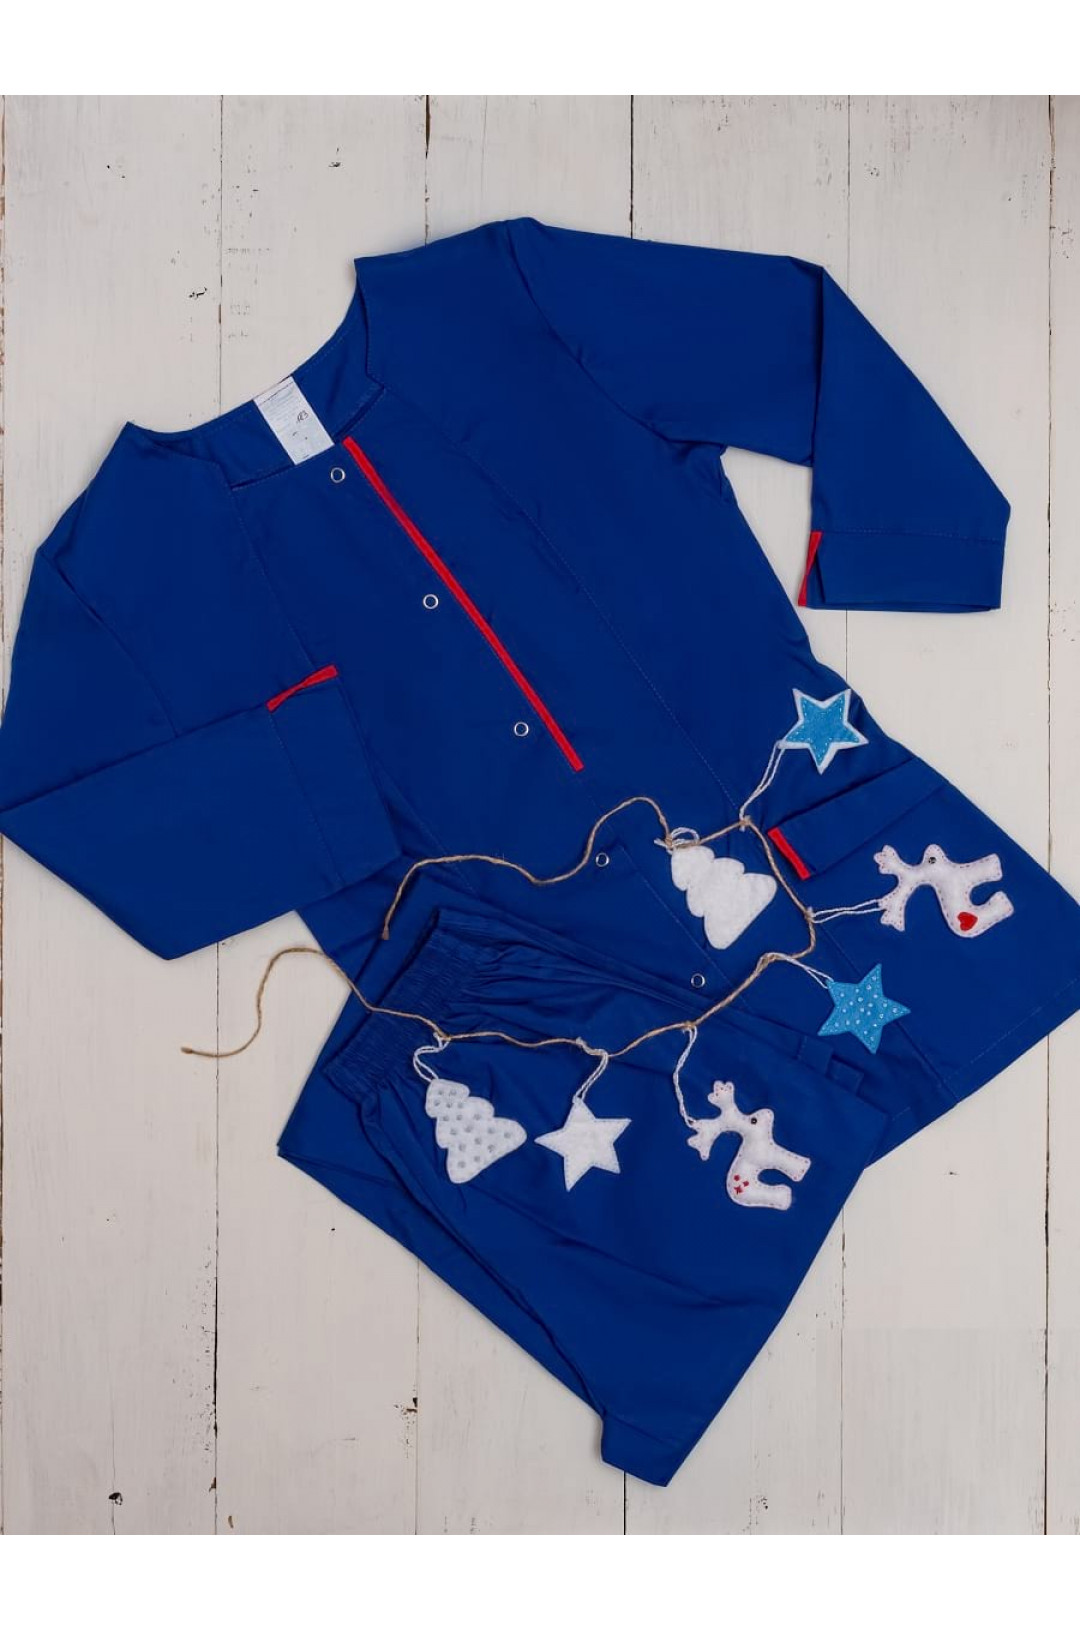 Костюм медицинский женский 183 (синий, тиси)